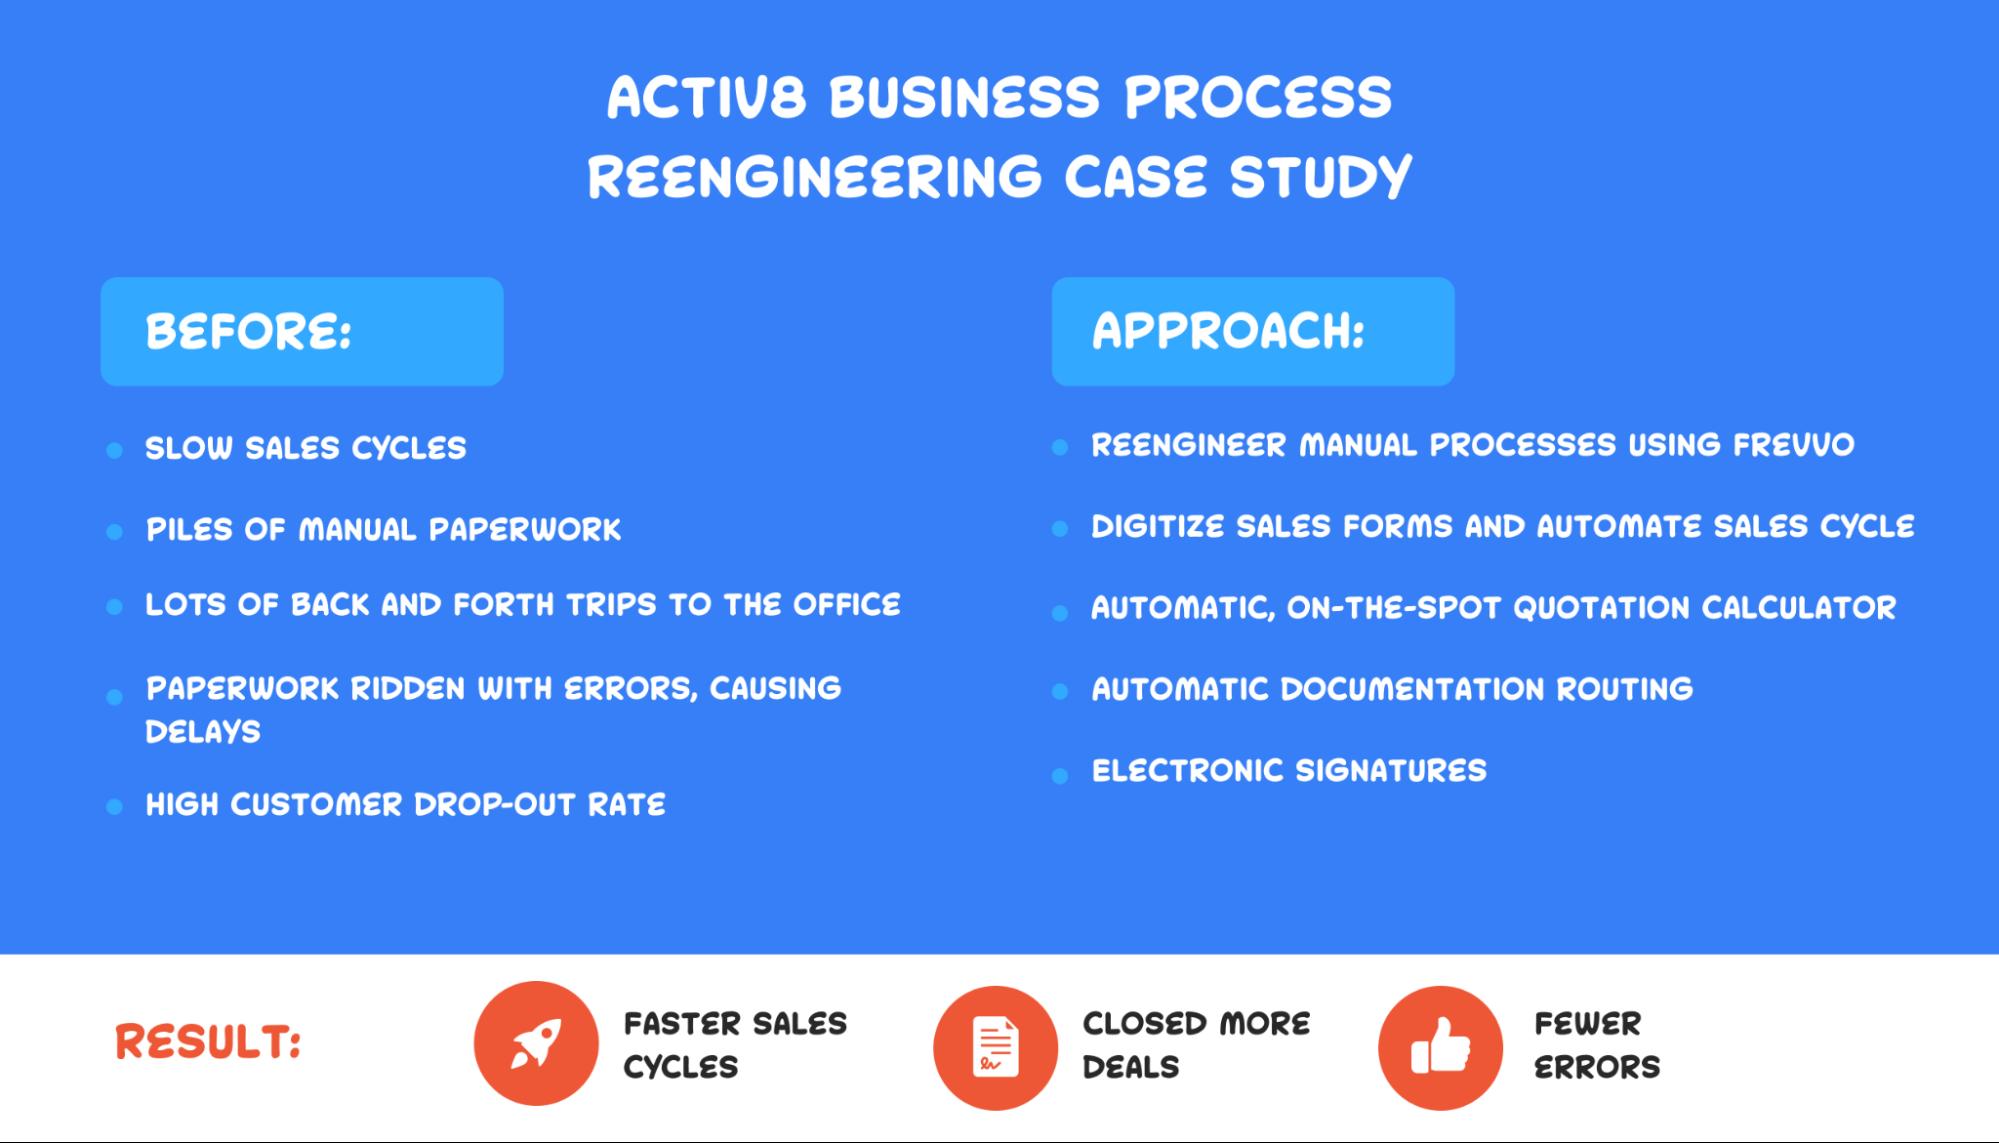 Activ8 business process reengineering case study